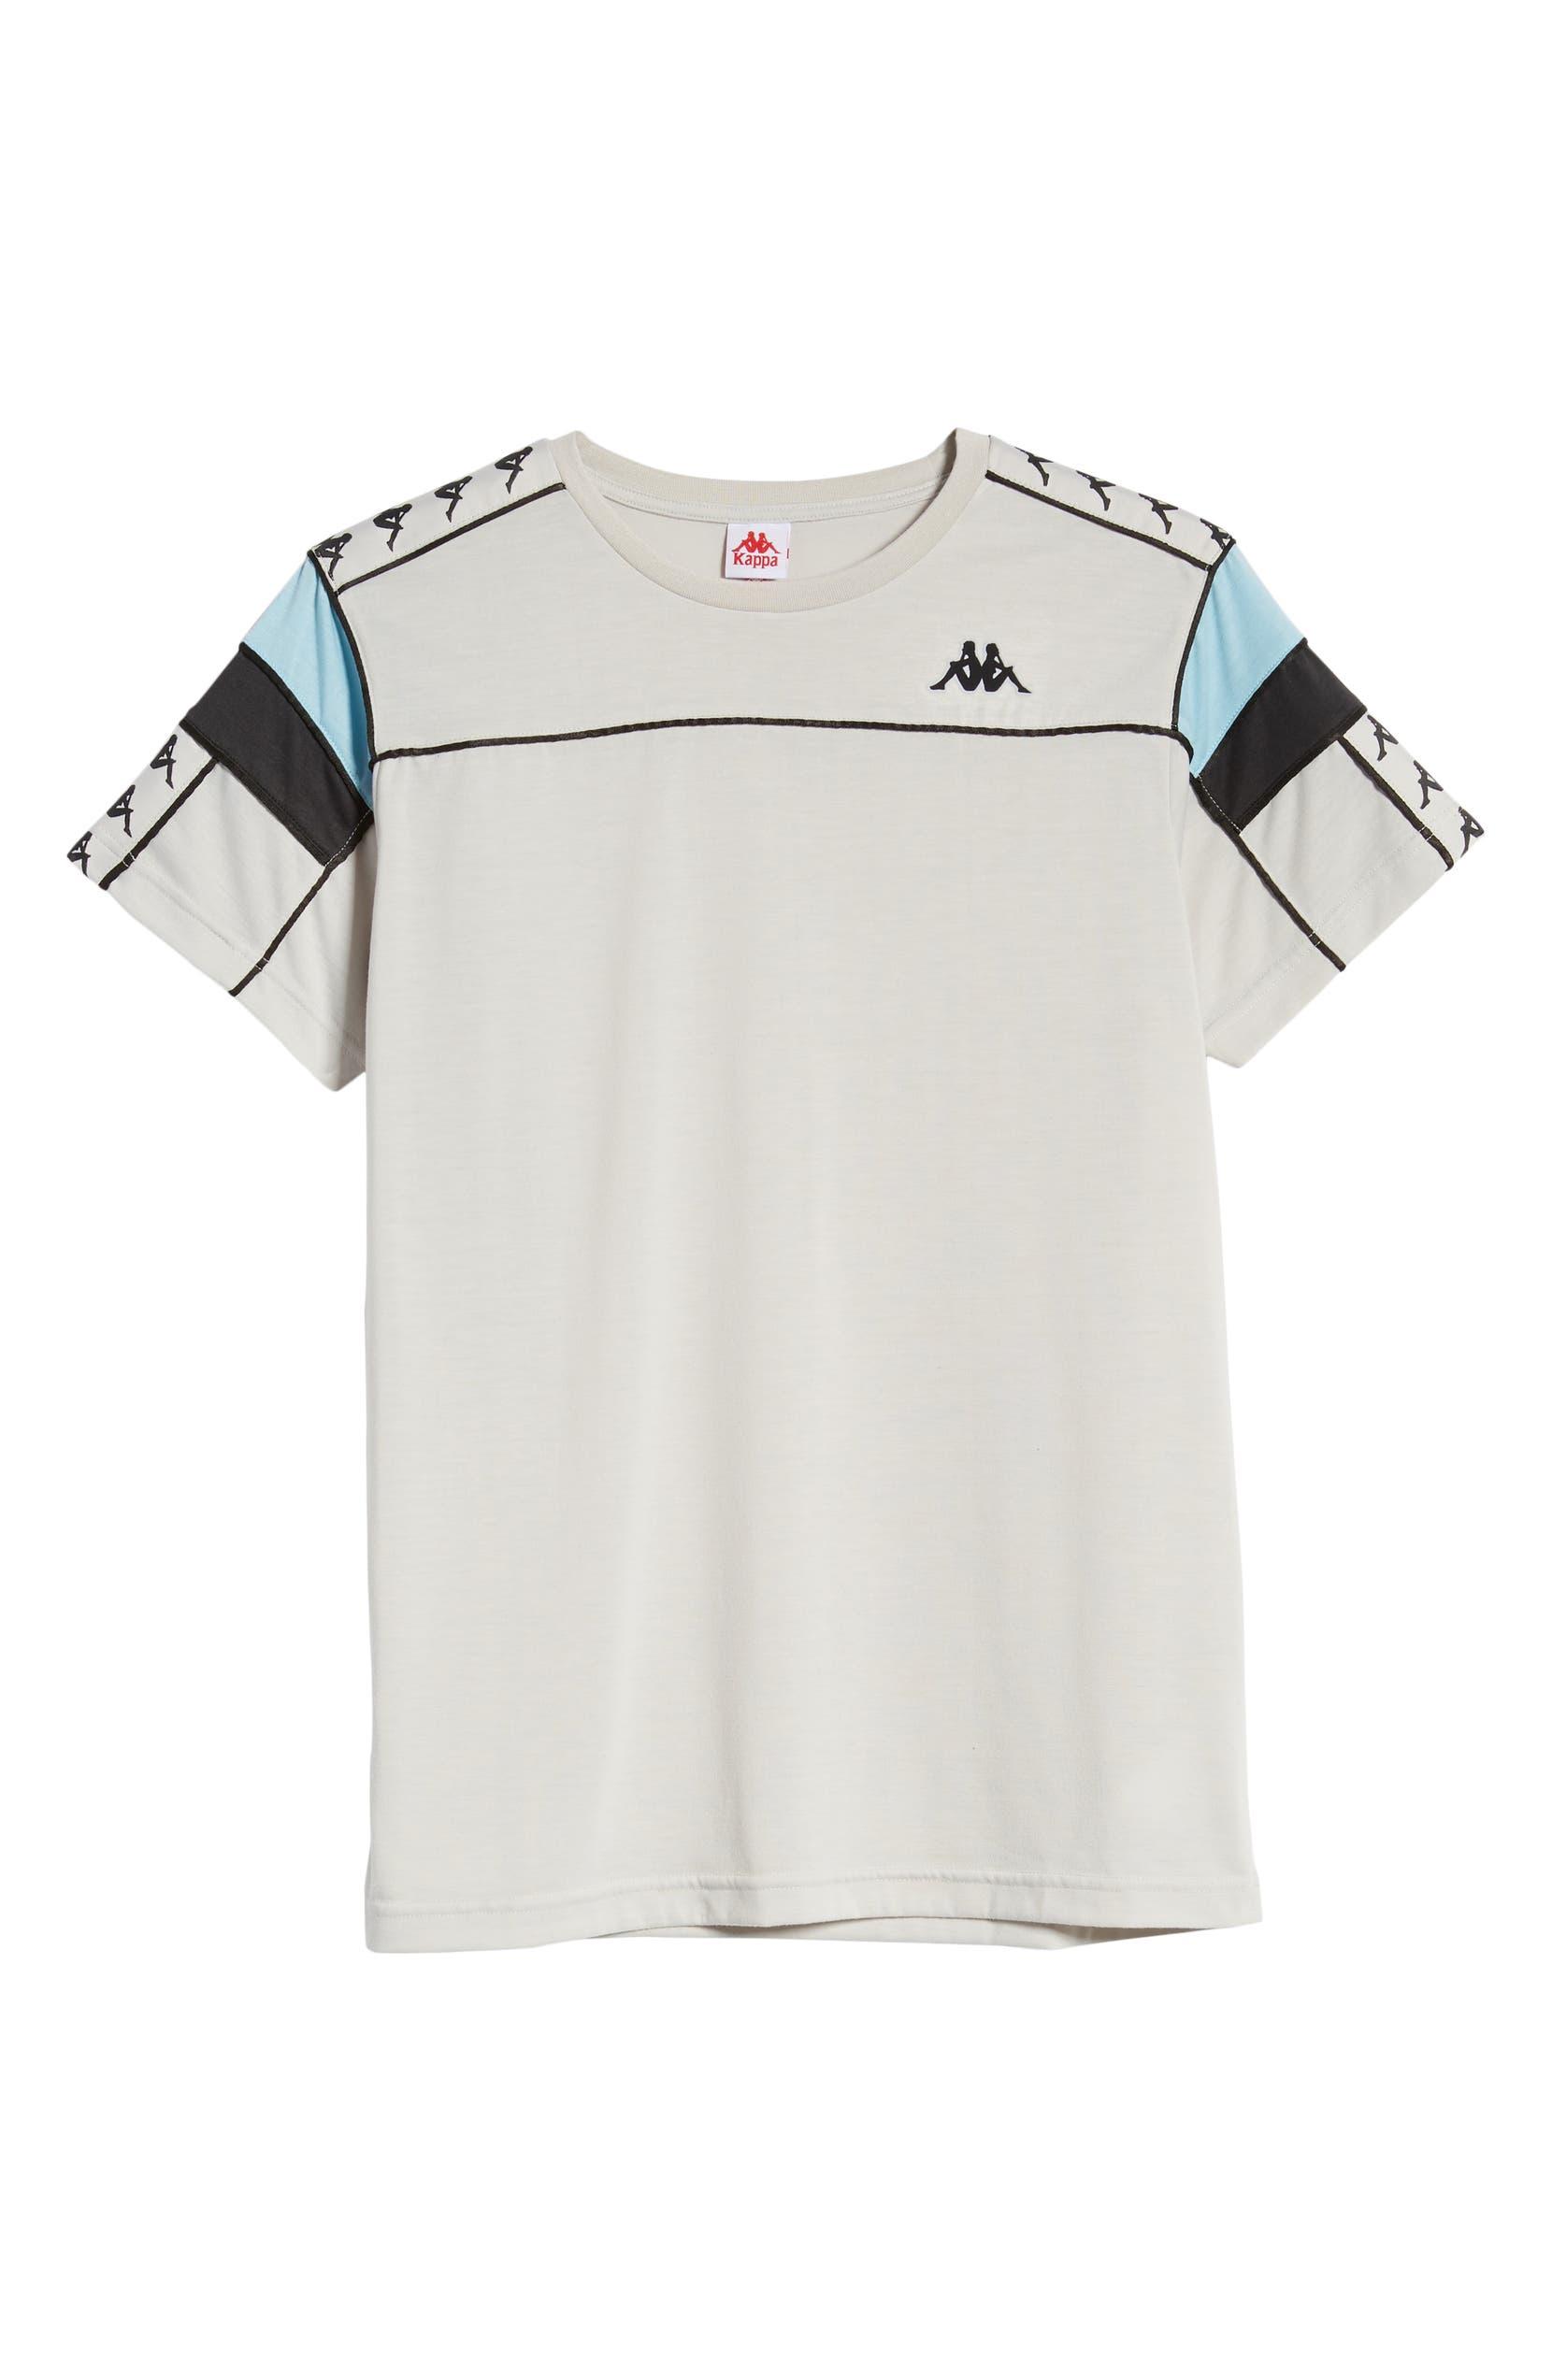 403f3dbf47 Kappa Active 222 Banda Arar T-Shirt | Nordstrom